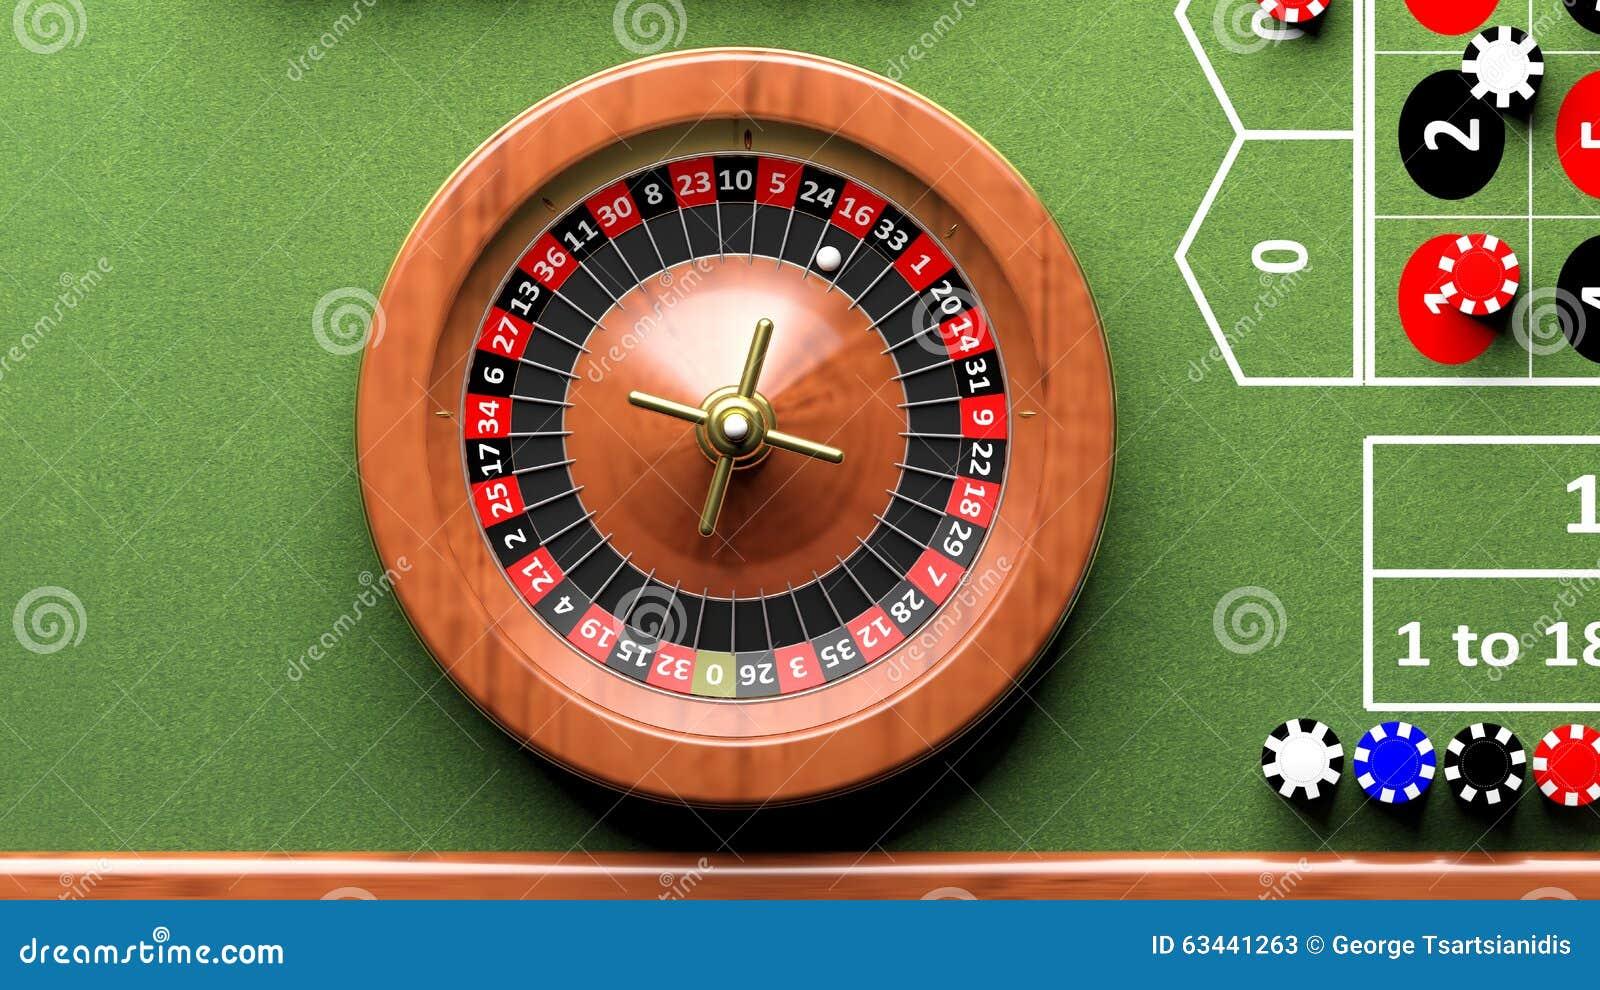 roulette kaufen games